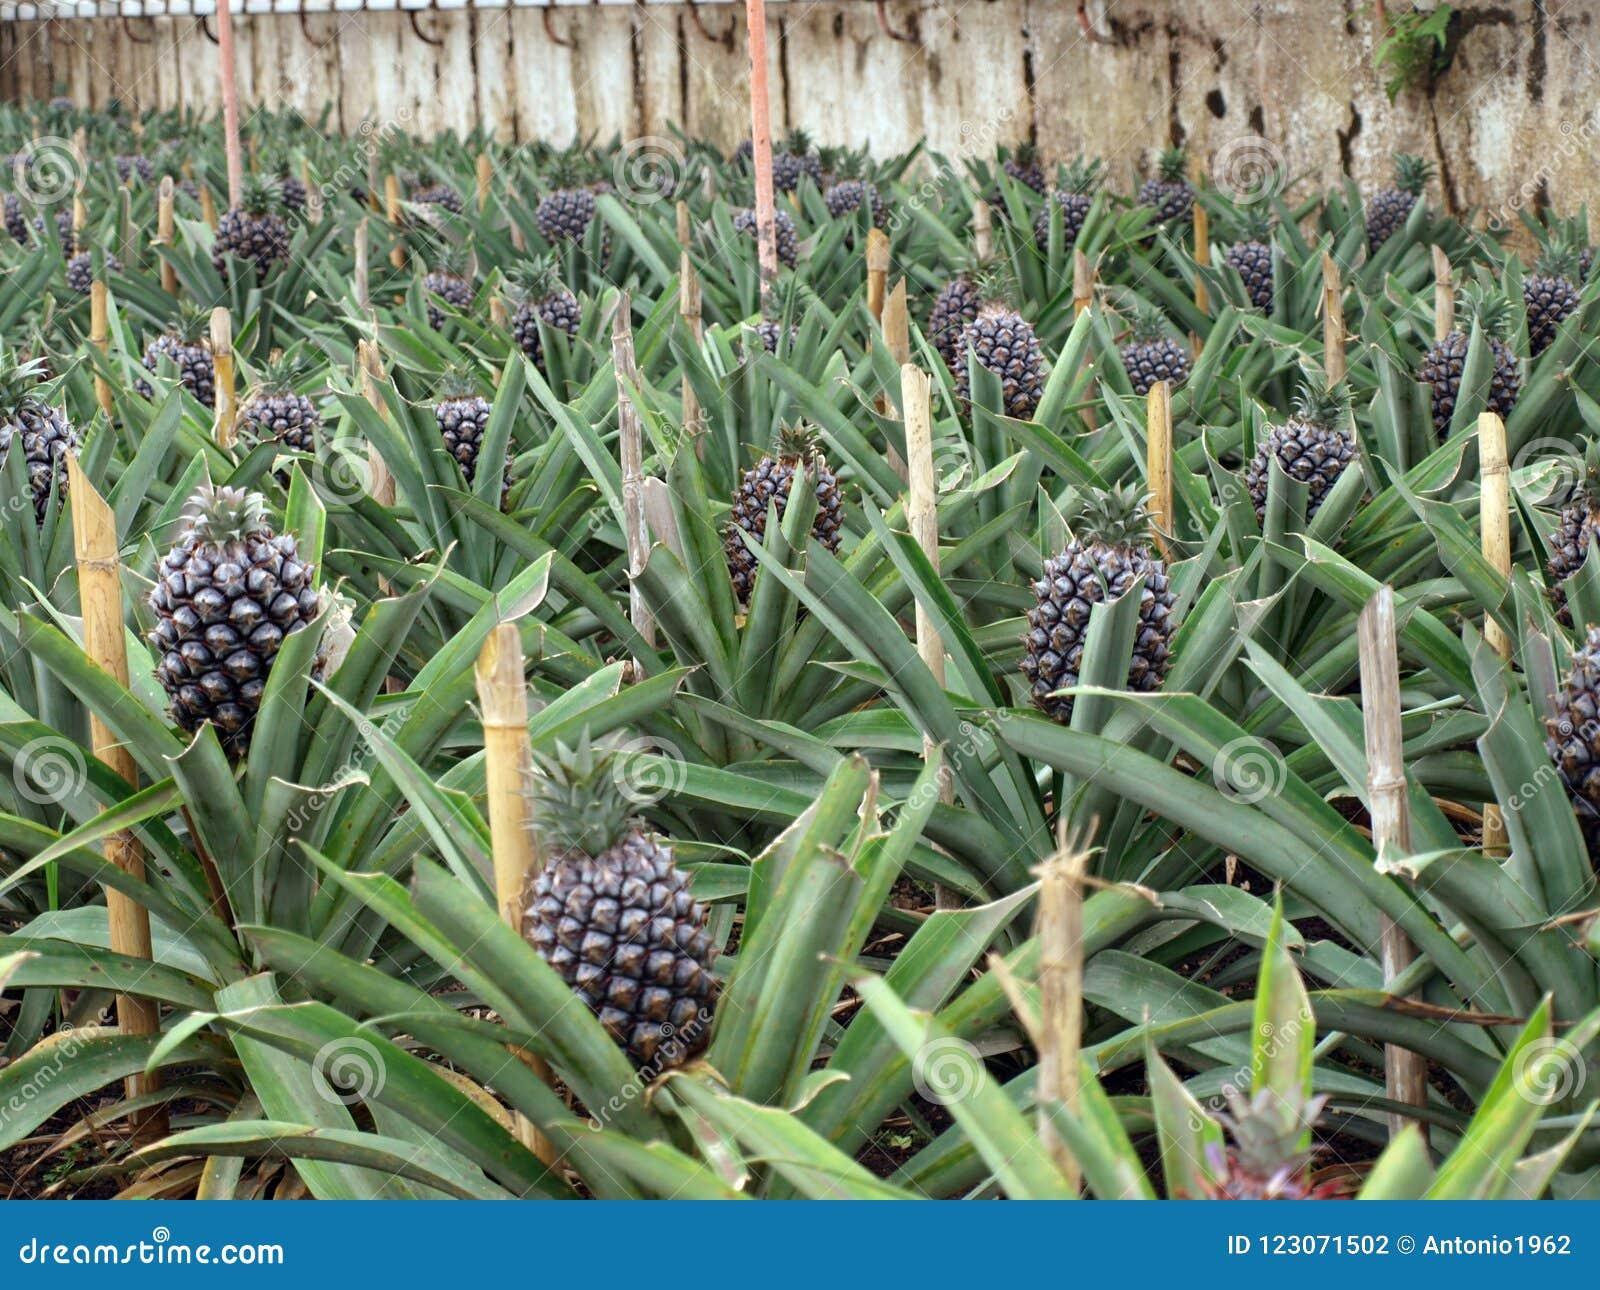 Pineapple plantation Ponta Delgada Azores Portugal